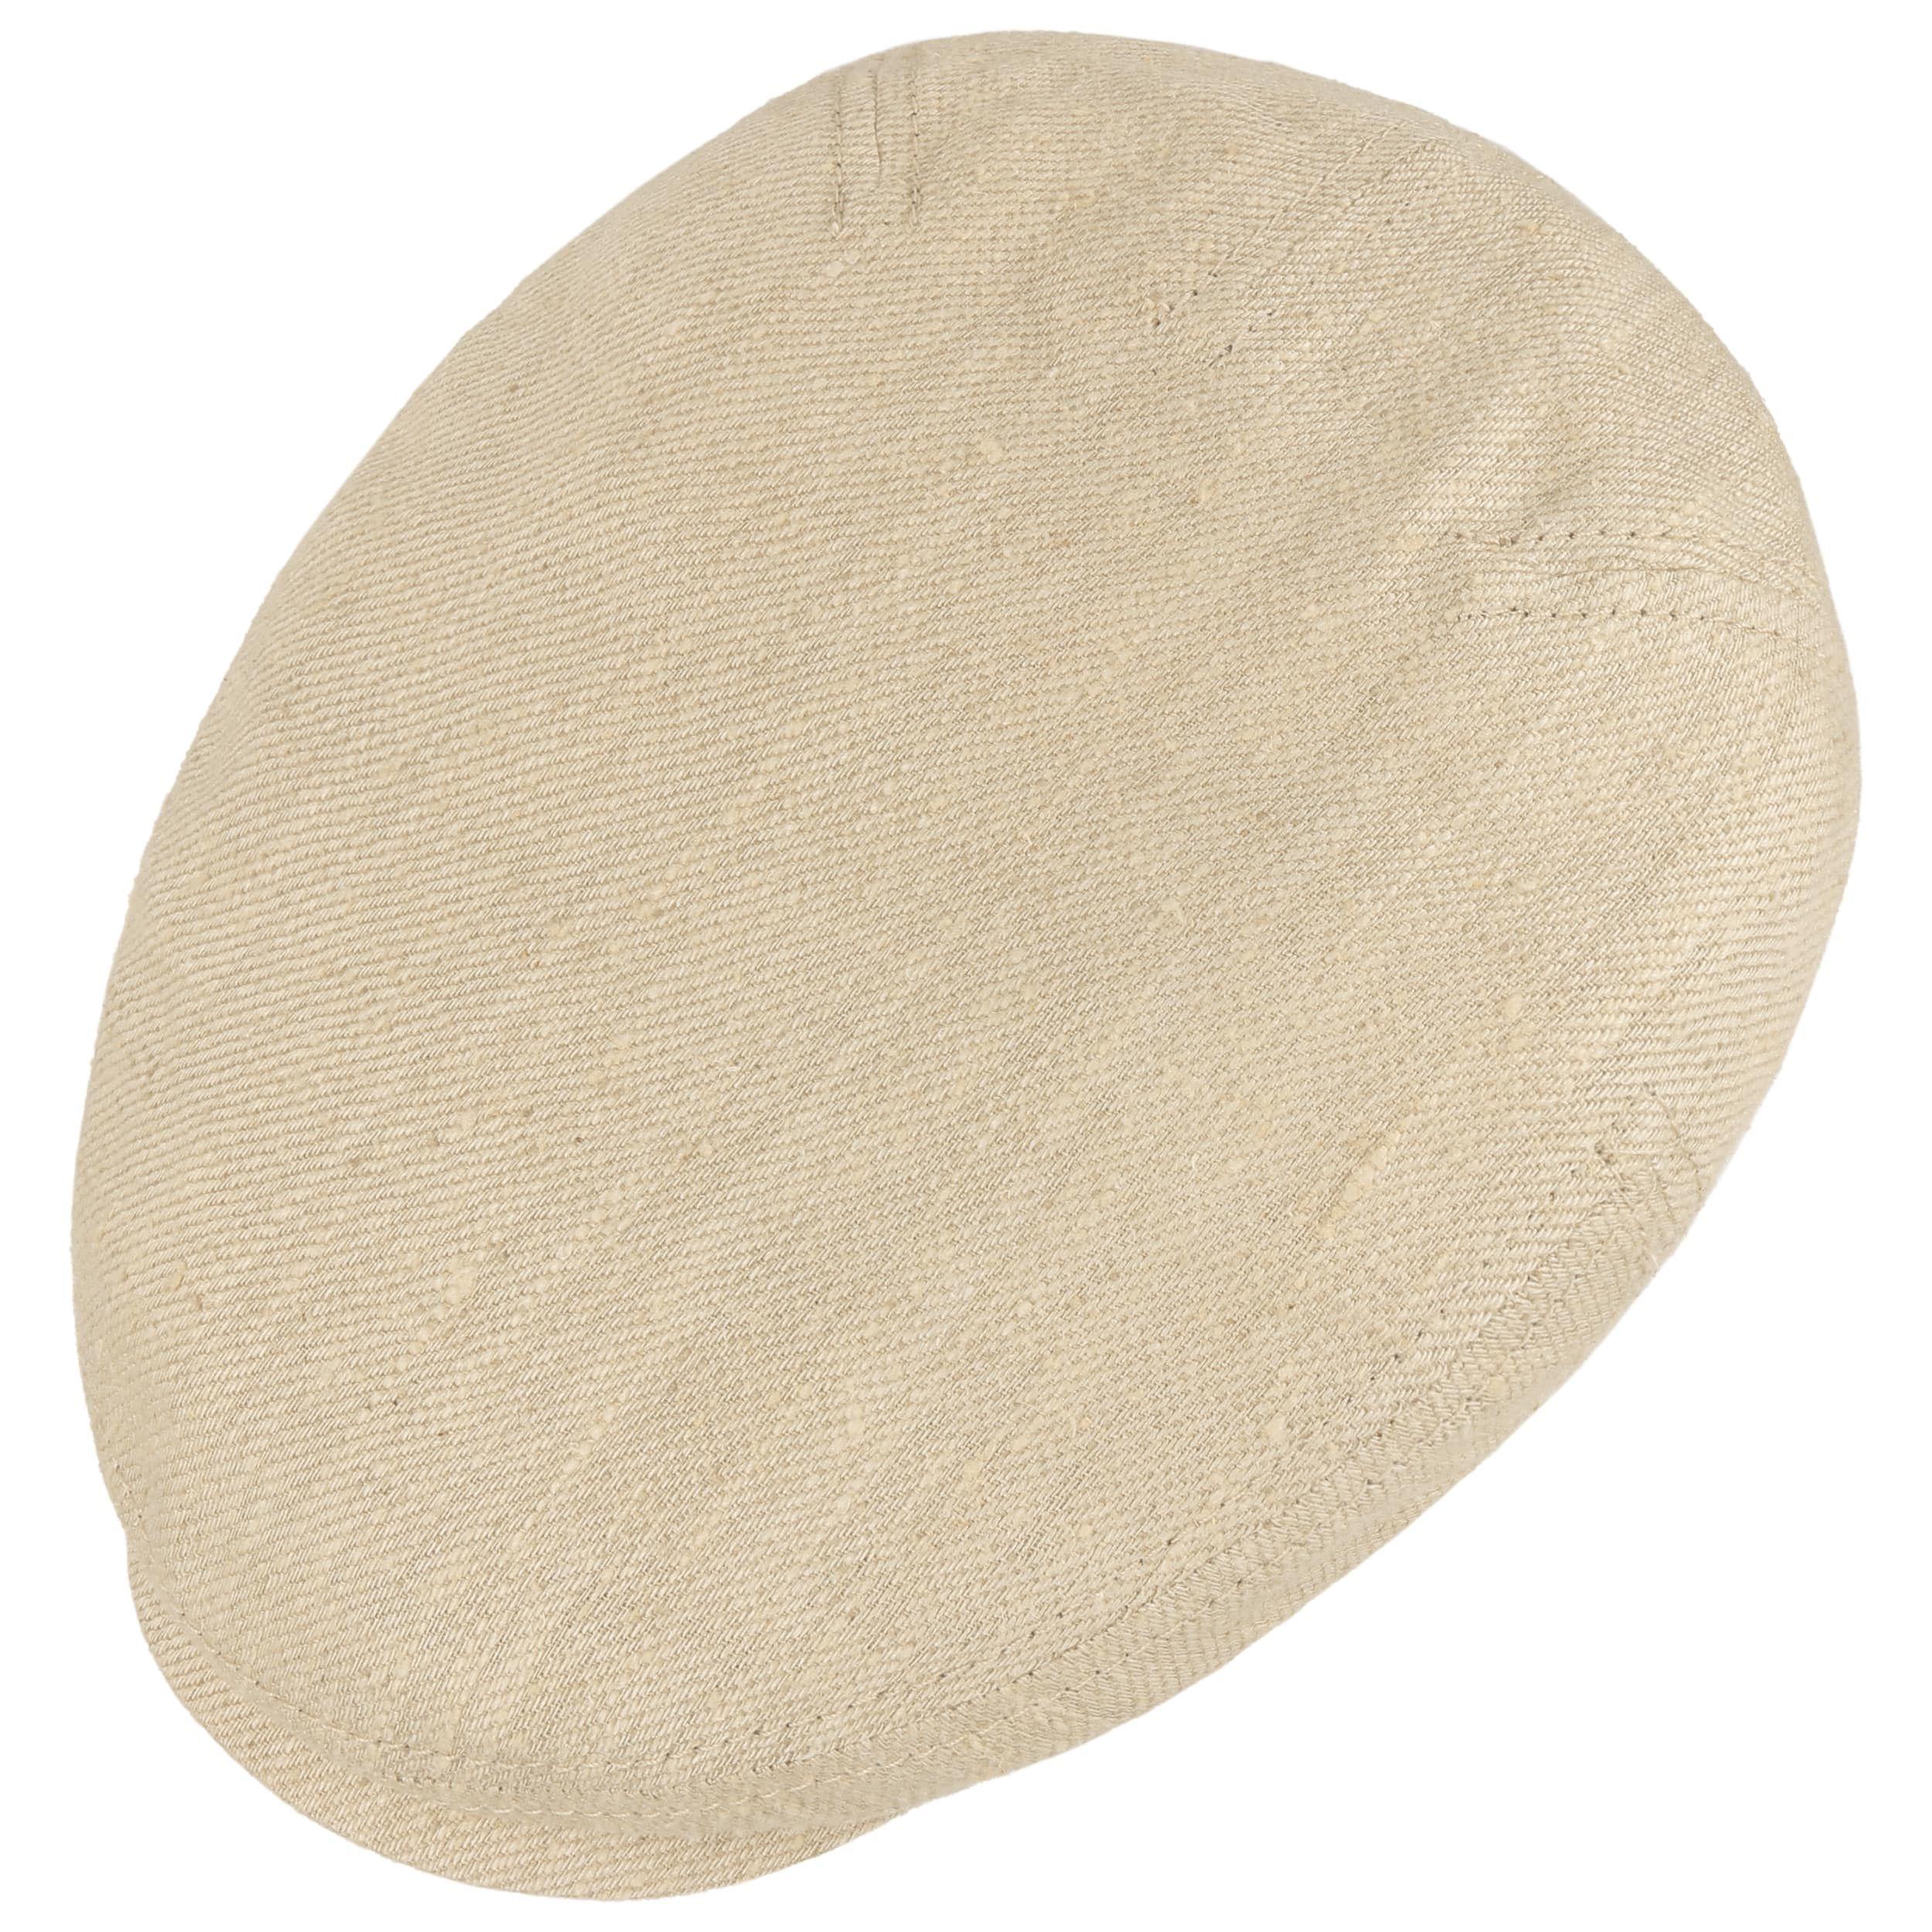 Premium Linen and Silk Flat Cap beige